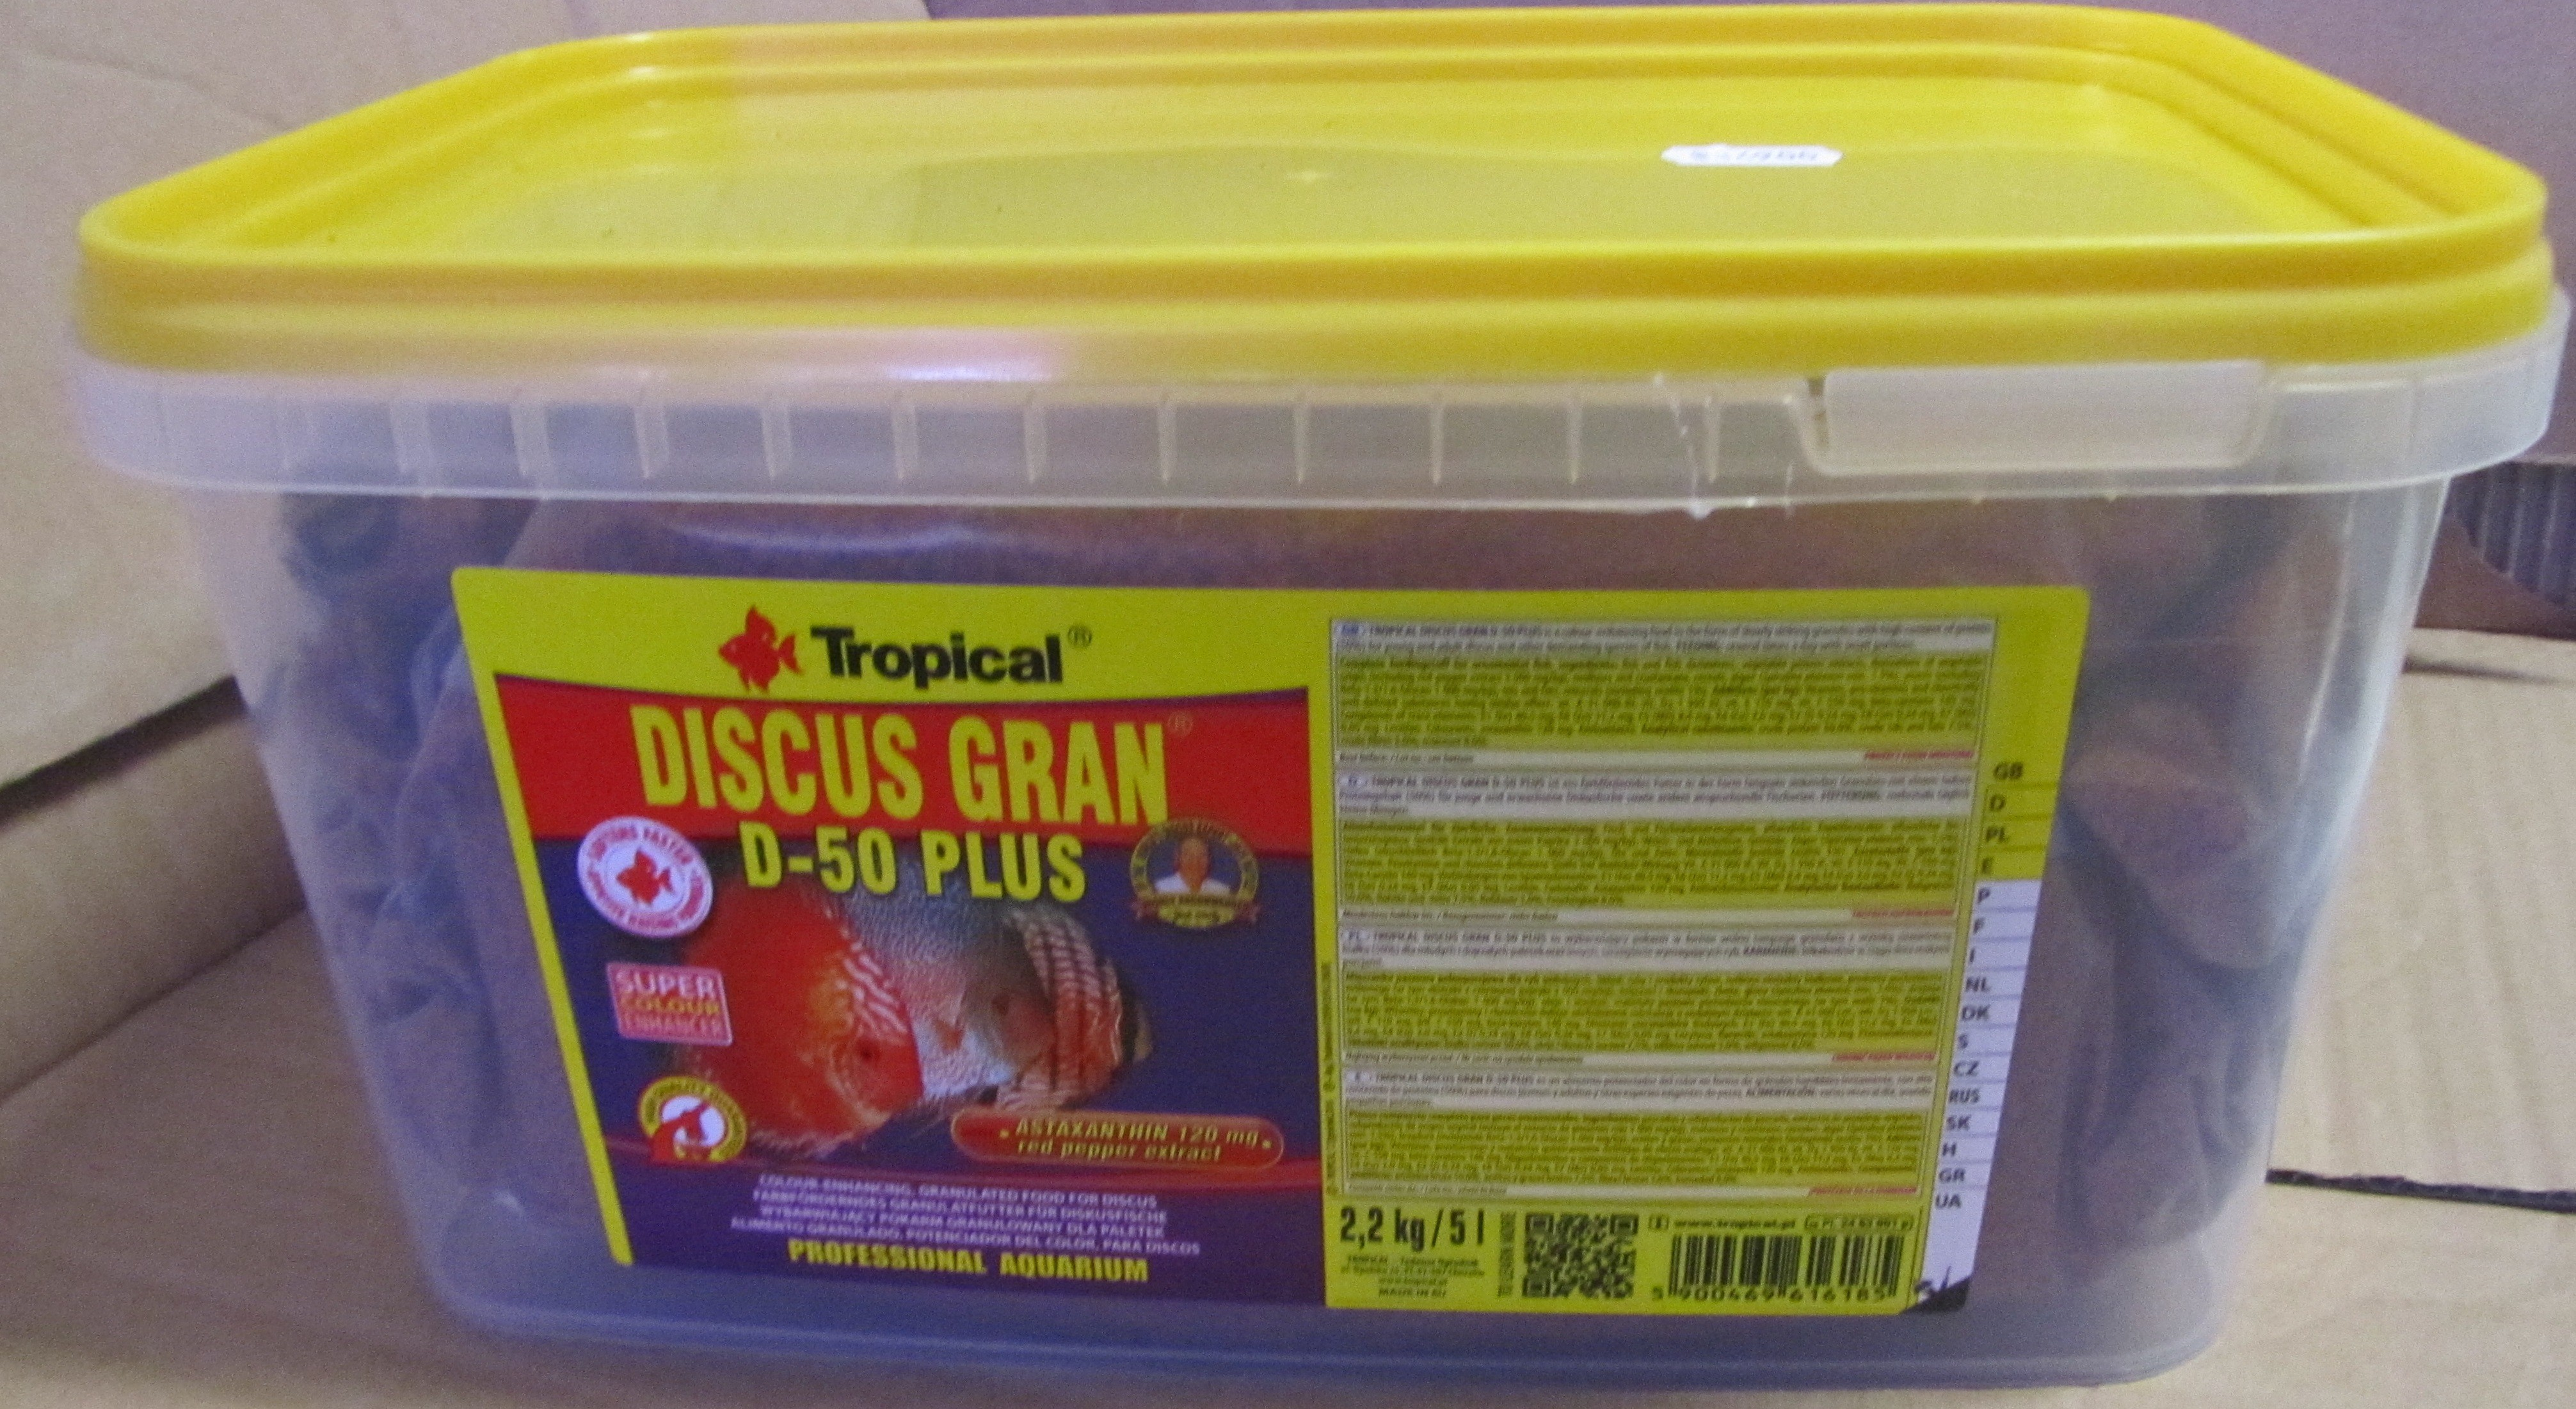 Tropical Discus granulat D-50 plus 5 Liter.